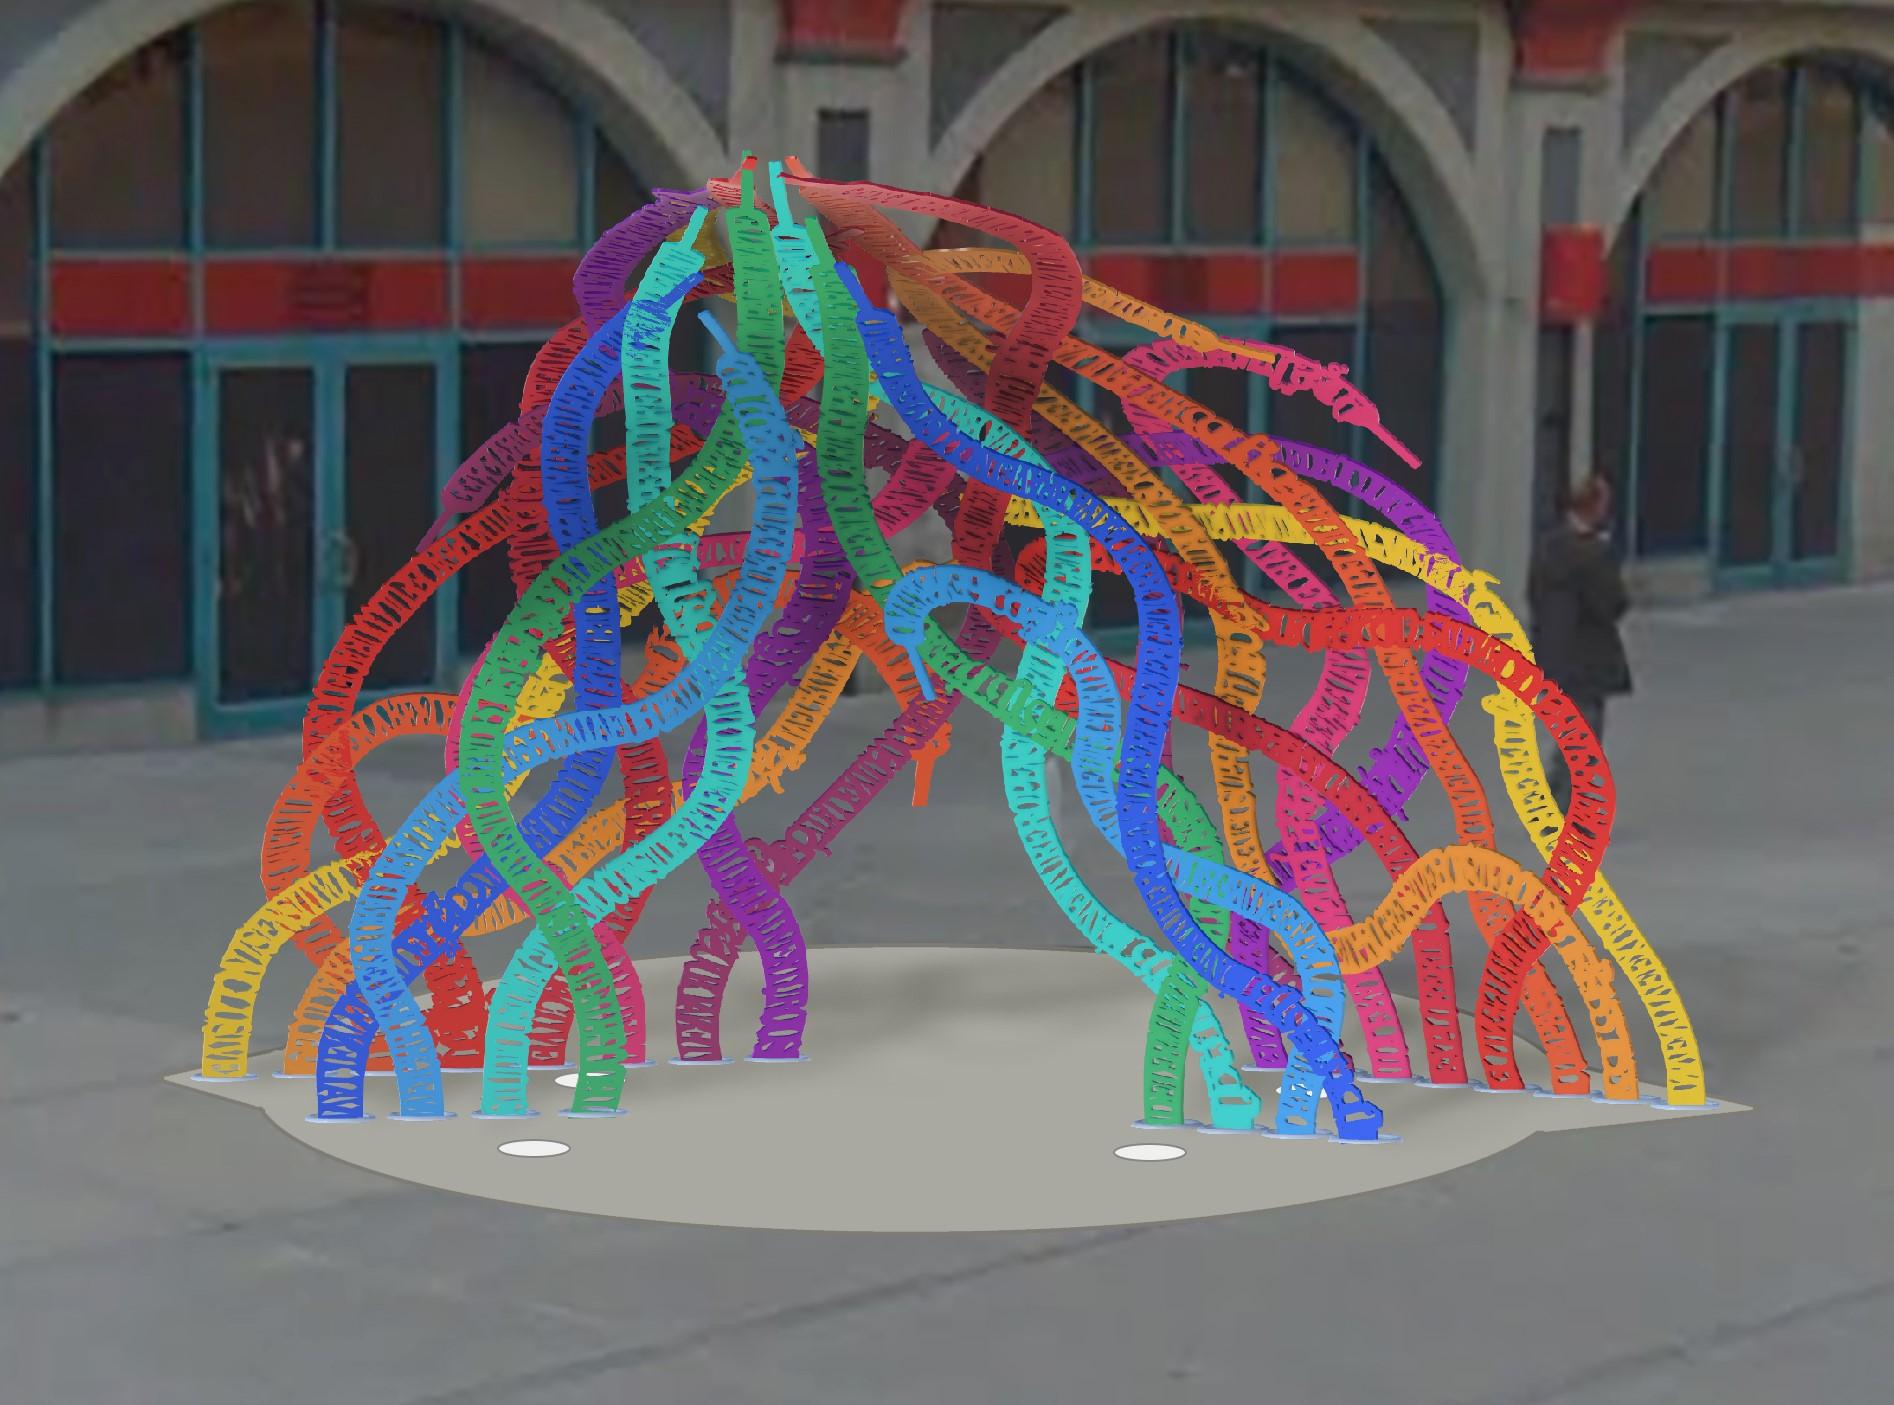 http://orloskystudio.com/wp-content/uploads/2021/10/in-plaza-1-crop.jpg